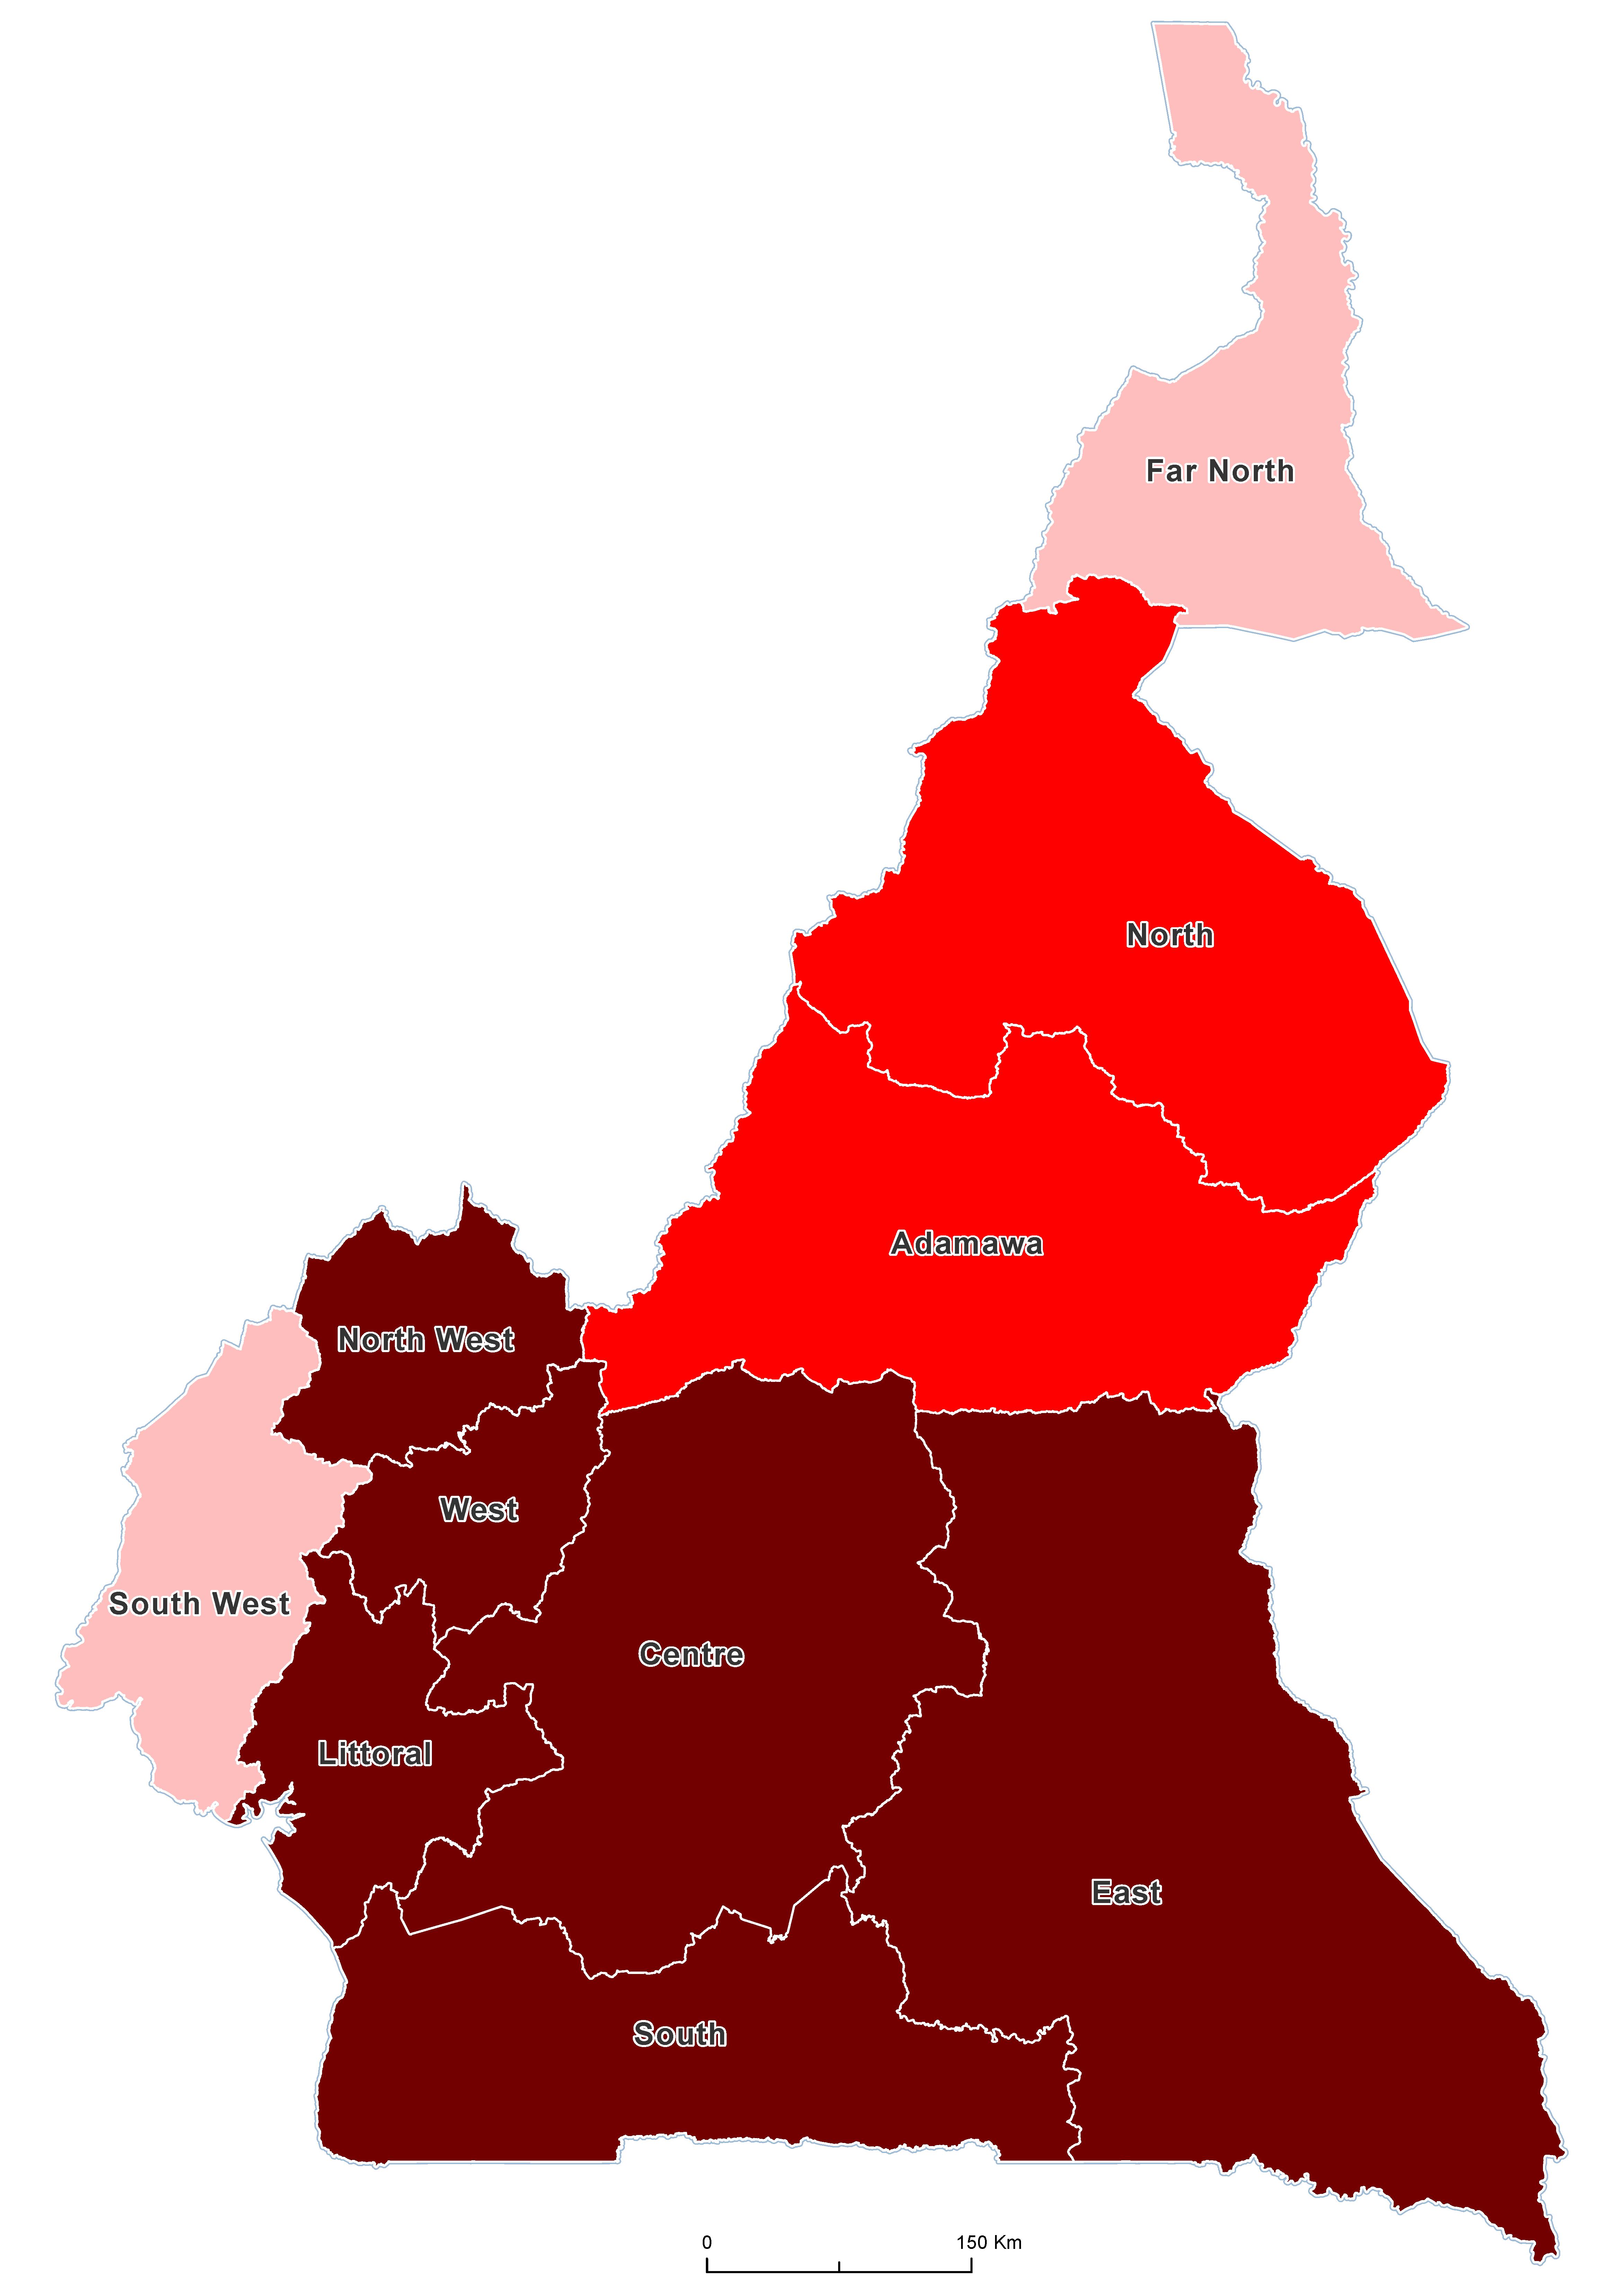 STH-Mean Prevalence 19850001